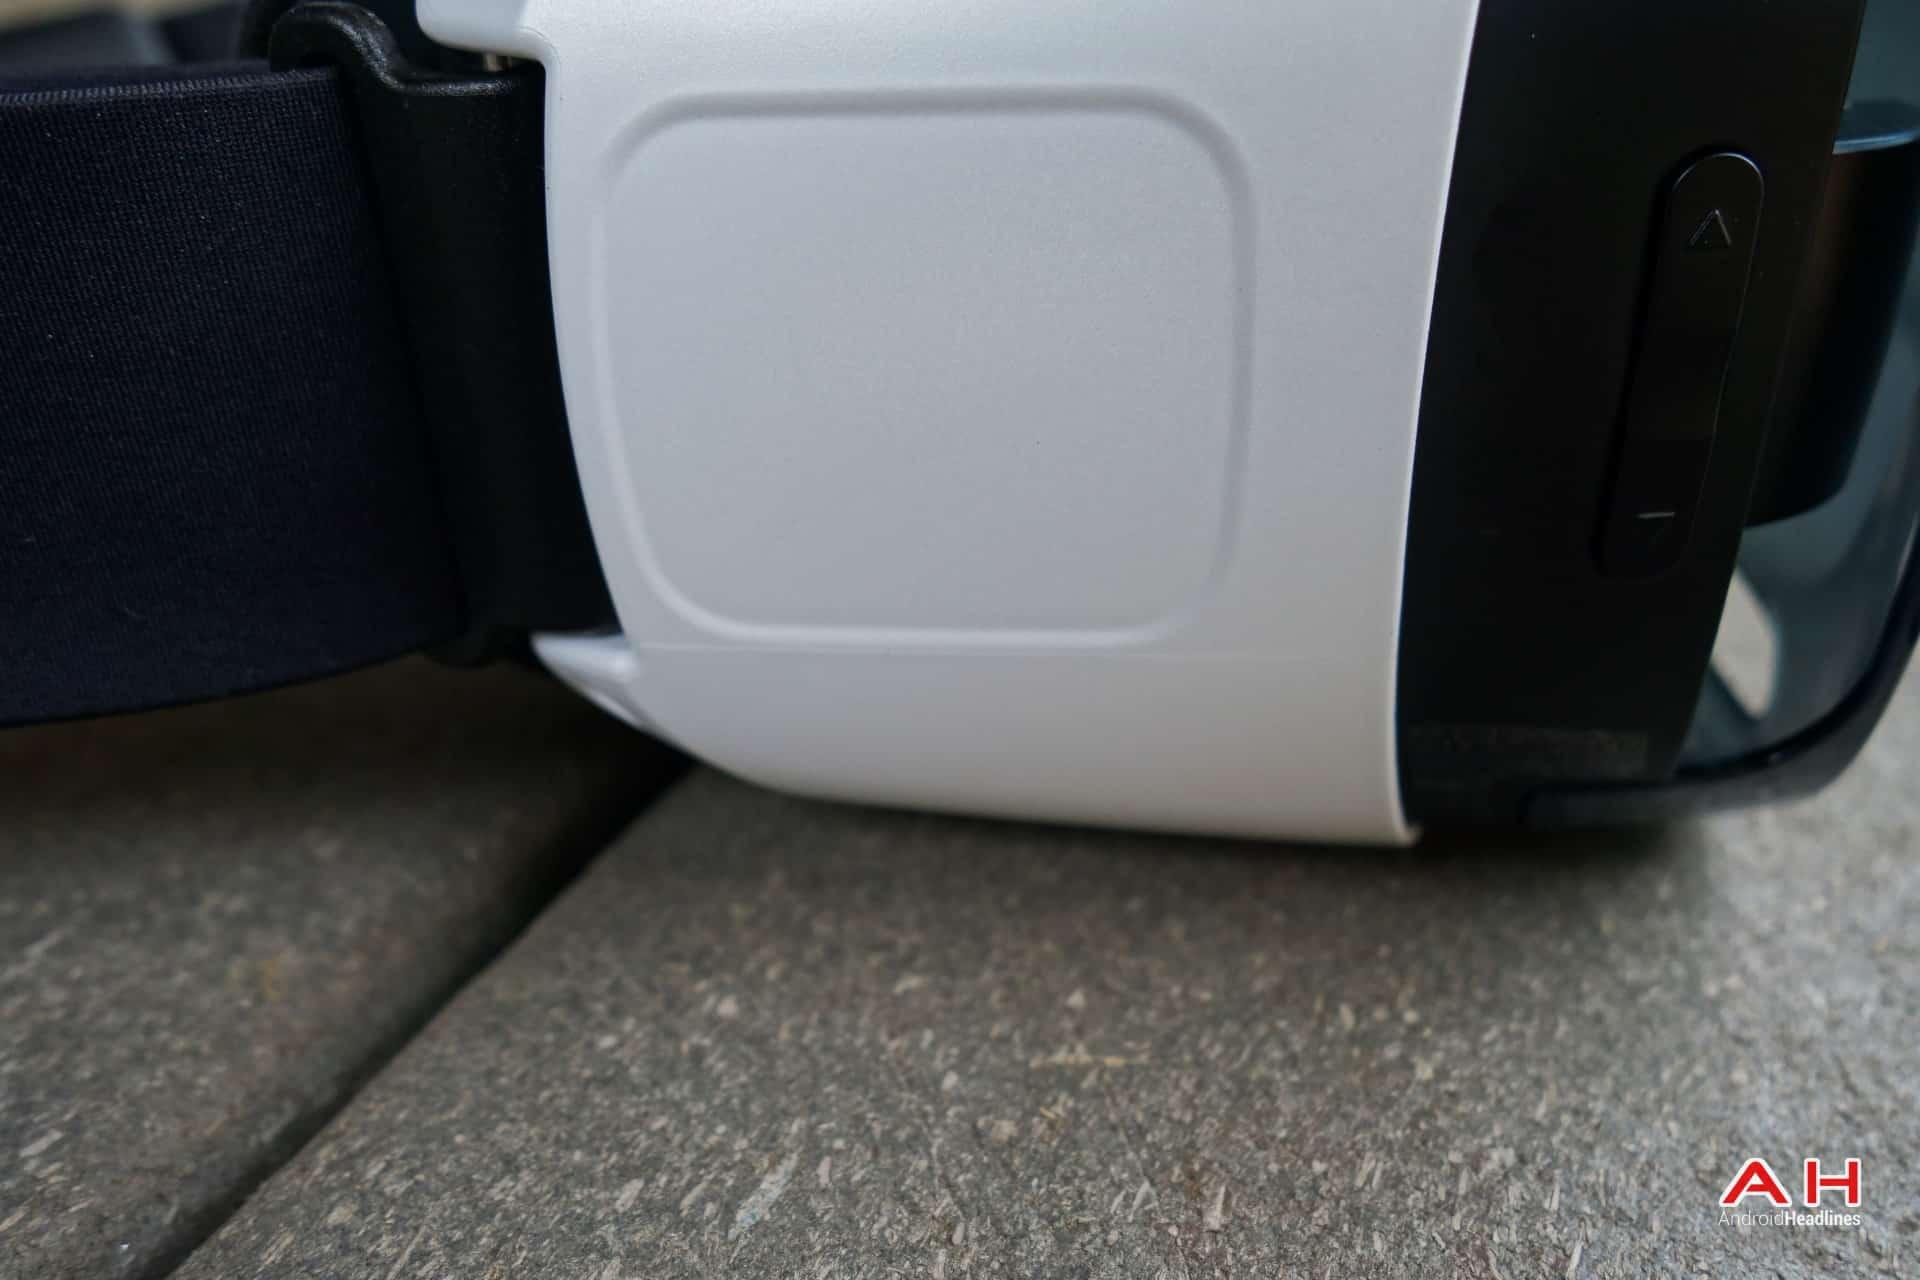 AH Samsung Gear VR 5